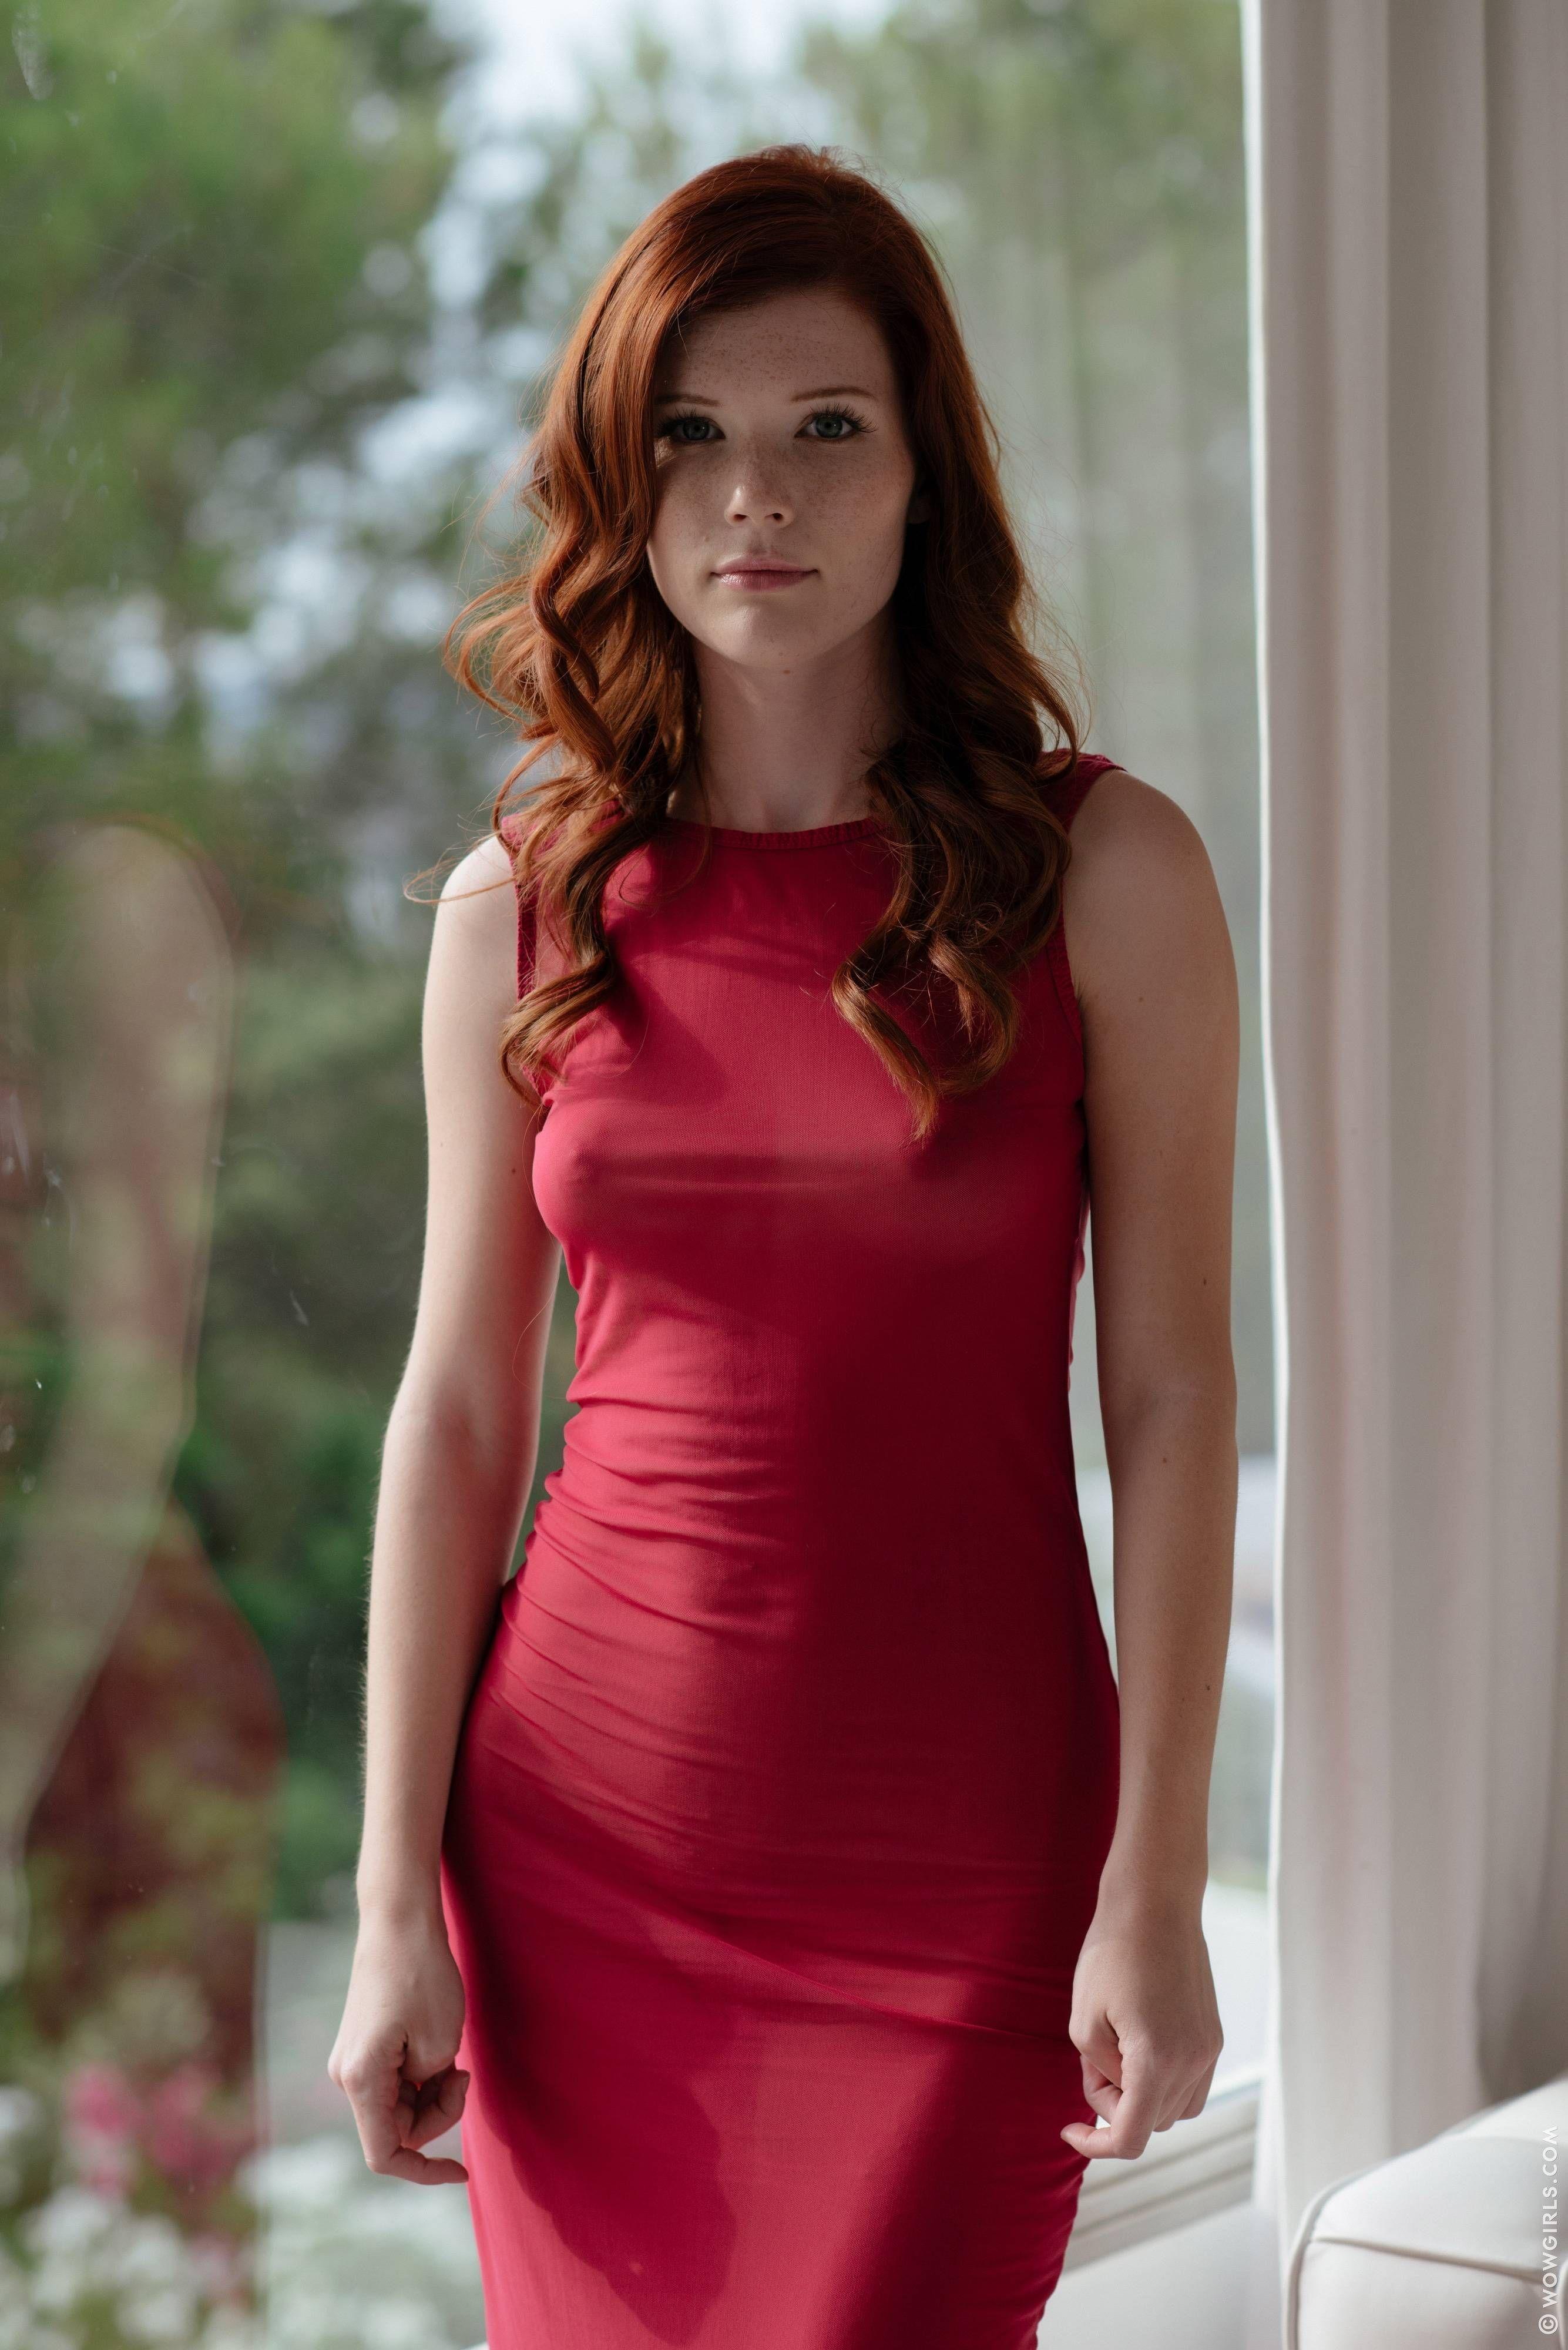 Evening dress heels redhead